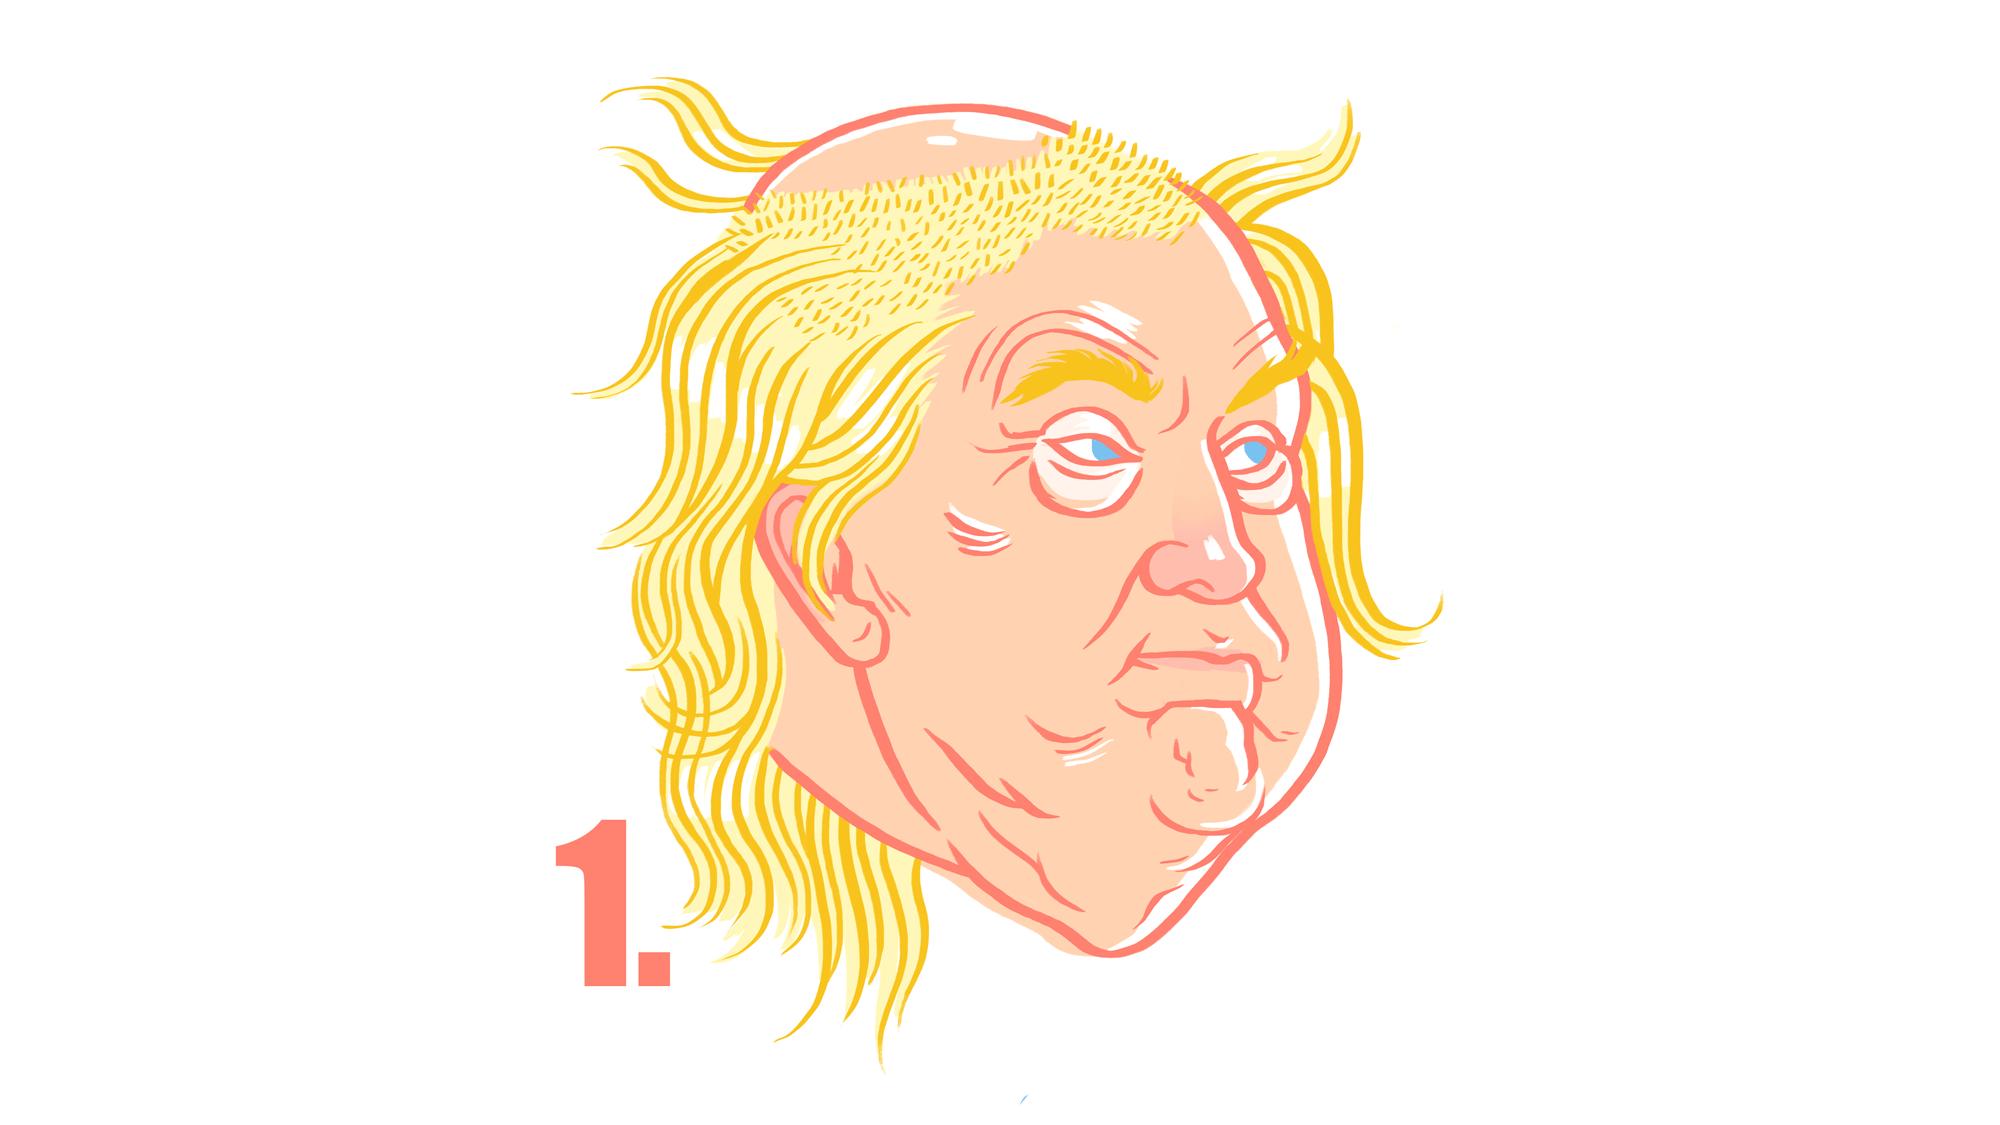 So Stylst Du Dir Die Haare Wie Donald Trump Vice